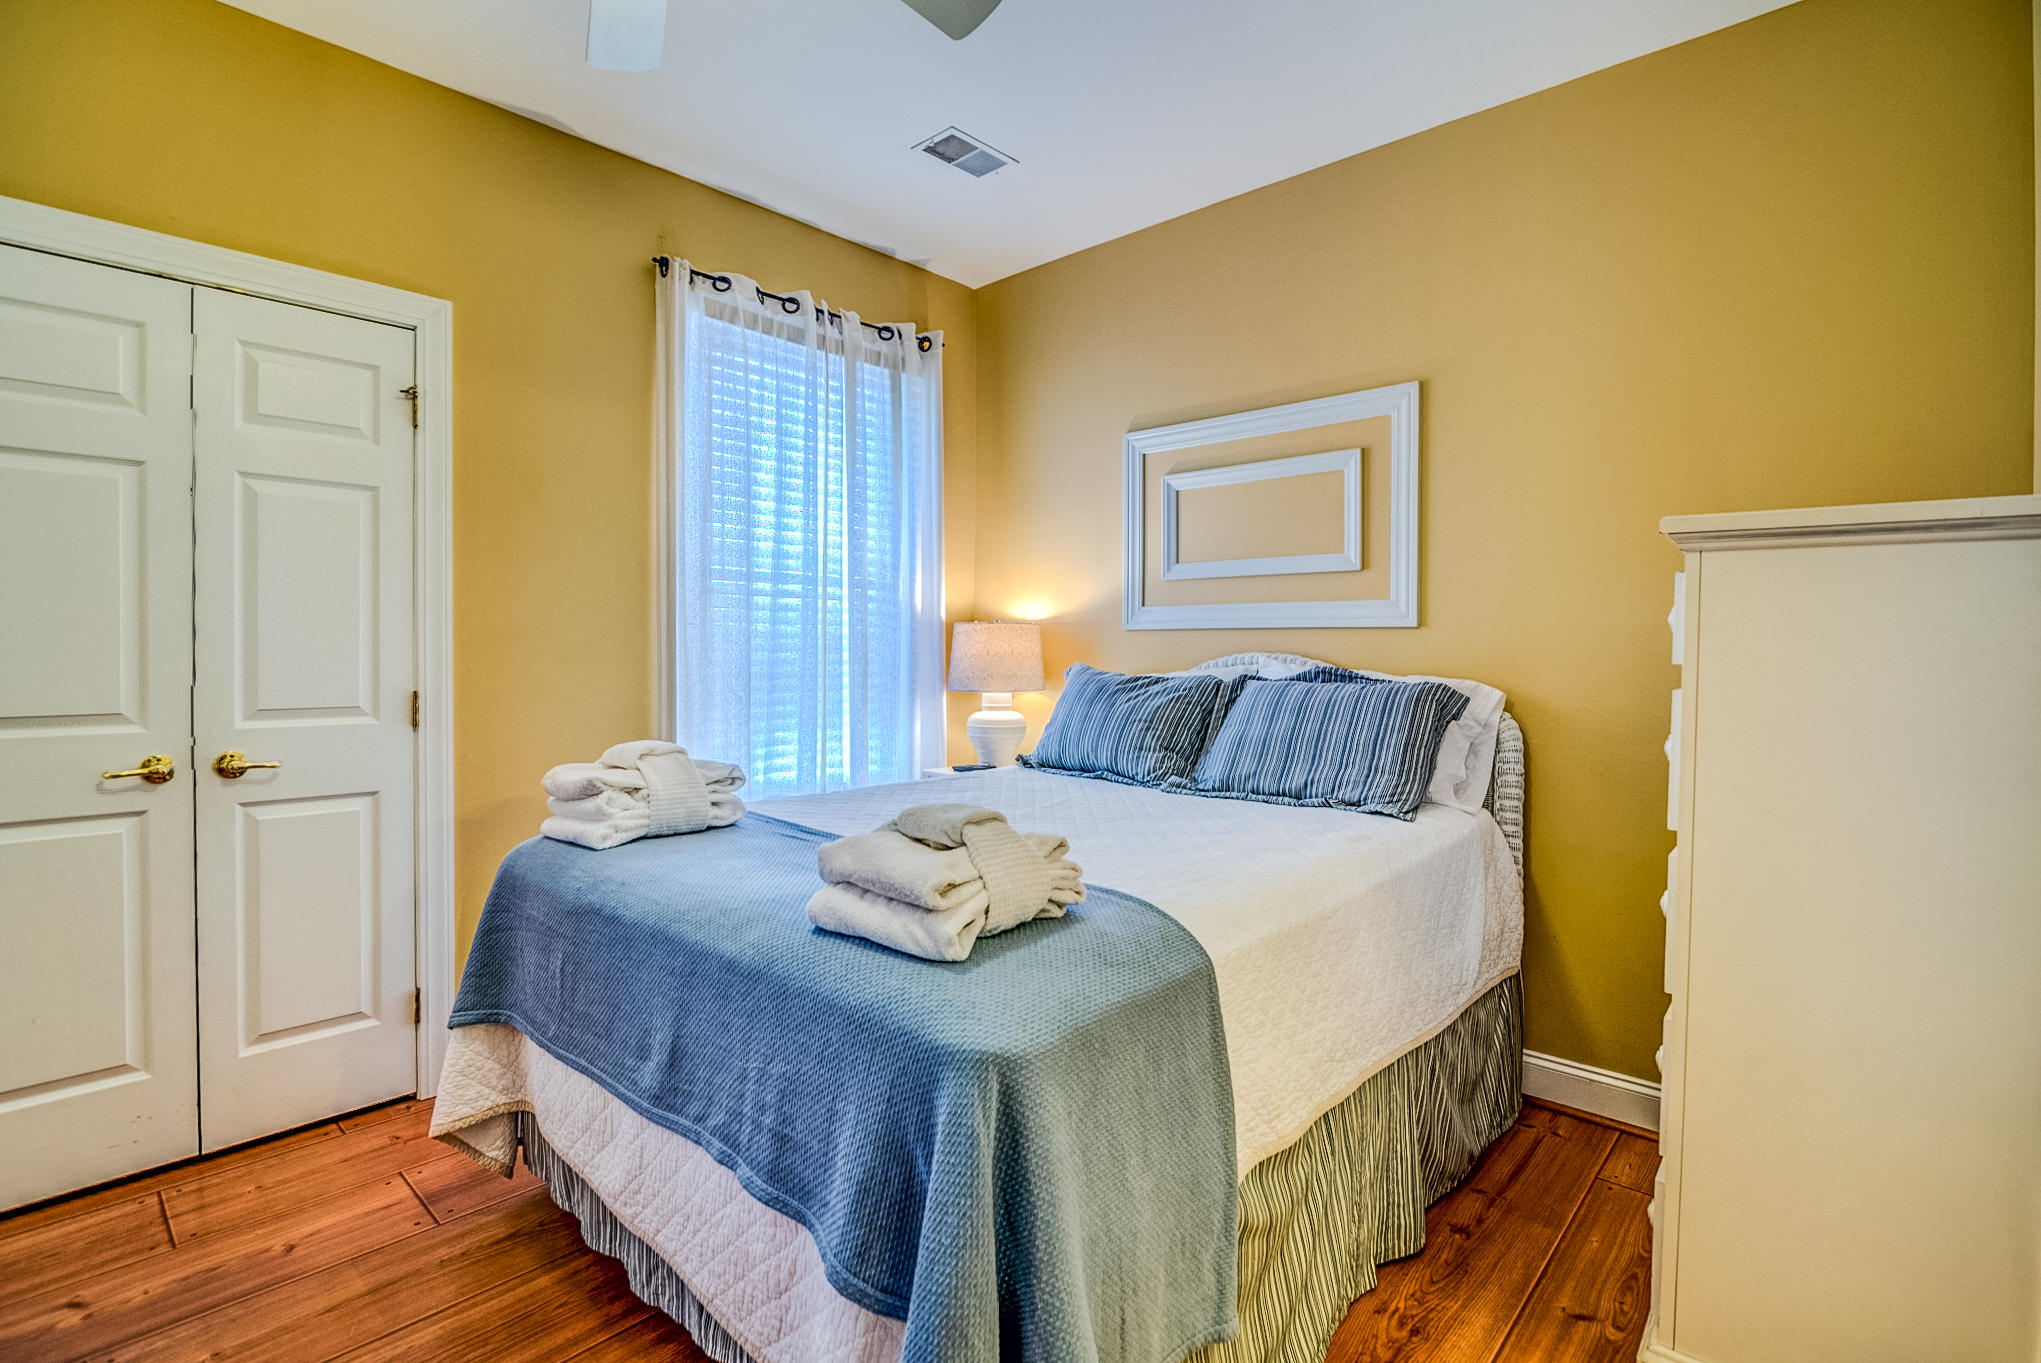 Ocean Pointe Villas Homes For Sale - 214 Arctic, Folly Beach, SC - 8